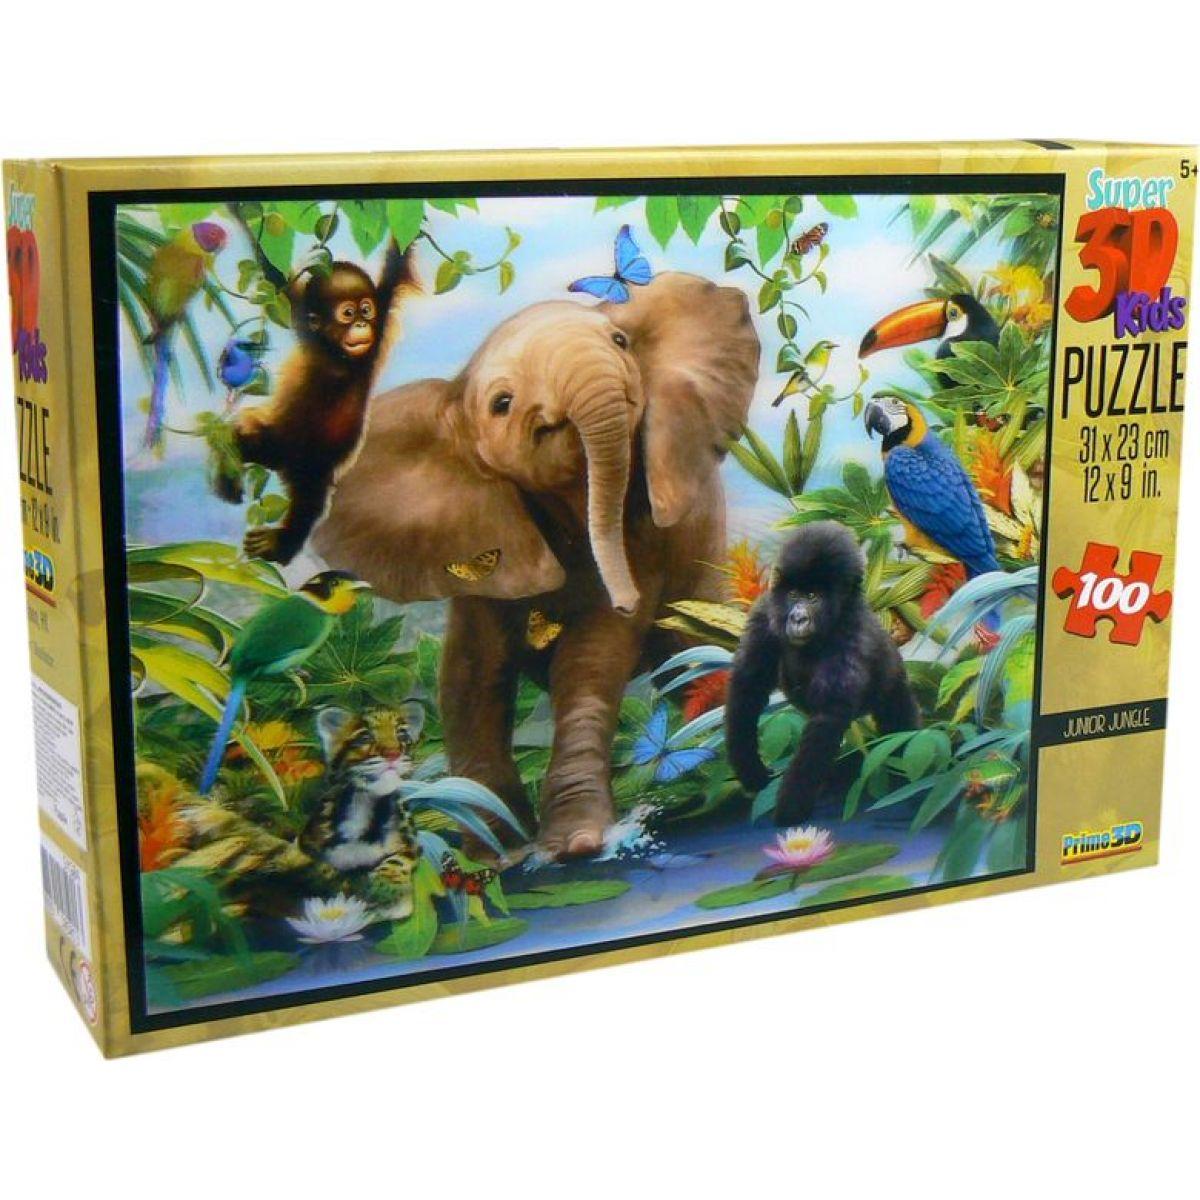 3D Puzzle Kids Jungle 100 dílků